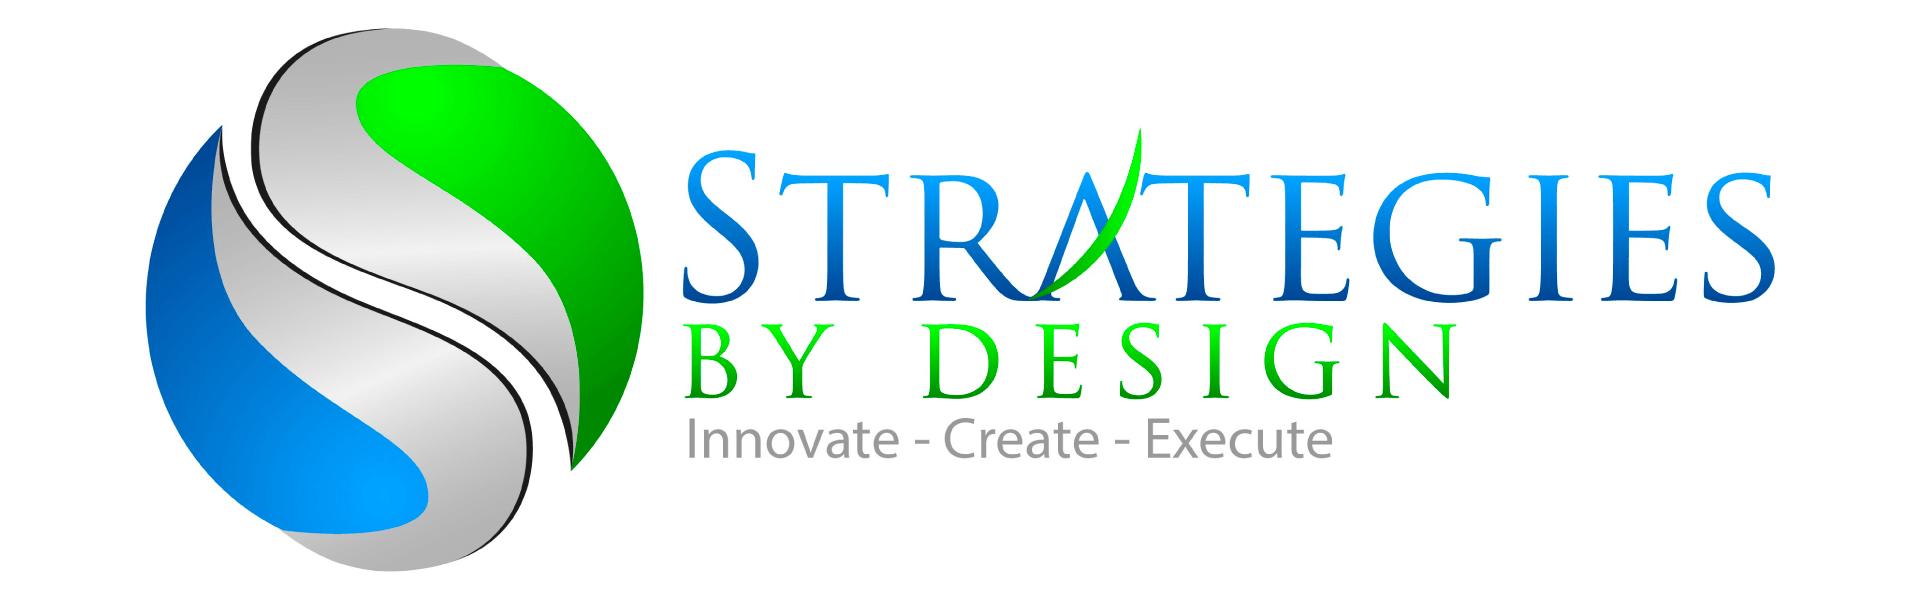 Strategies By Design Logo